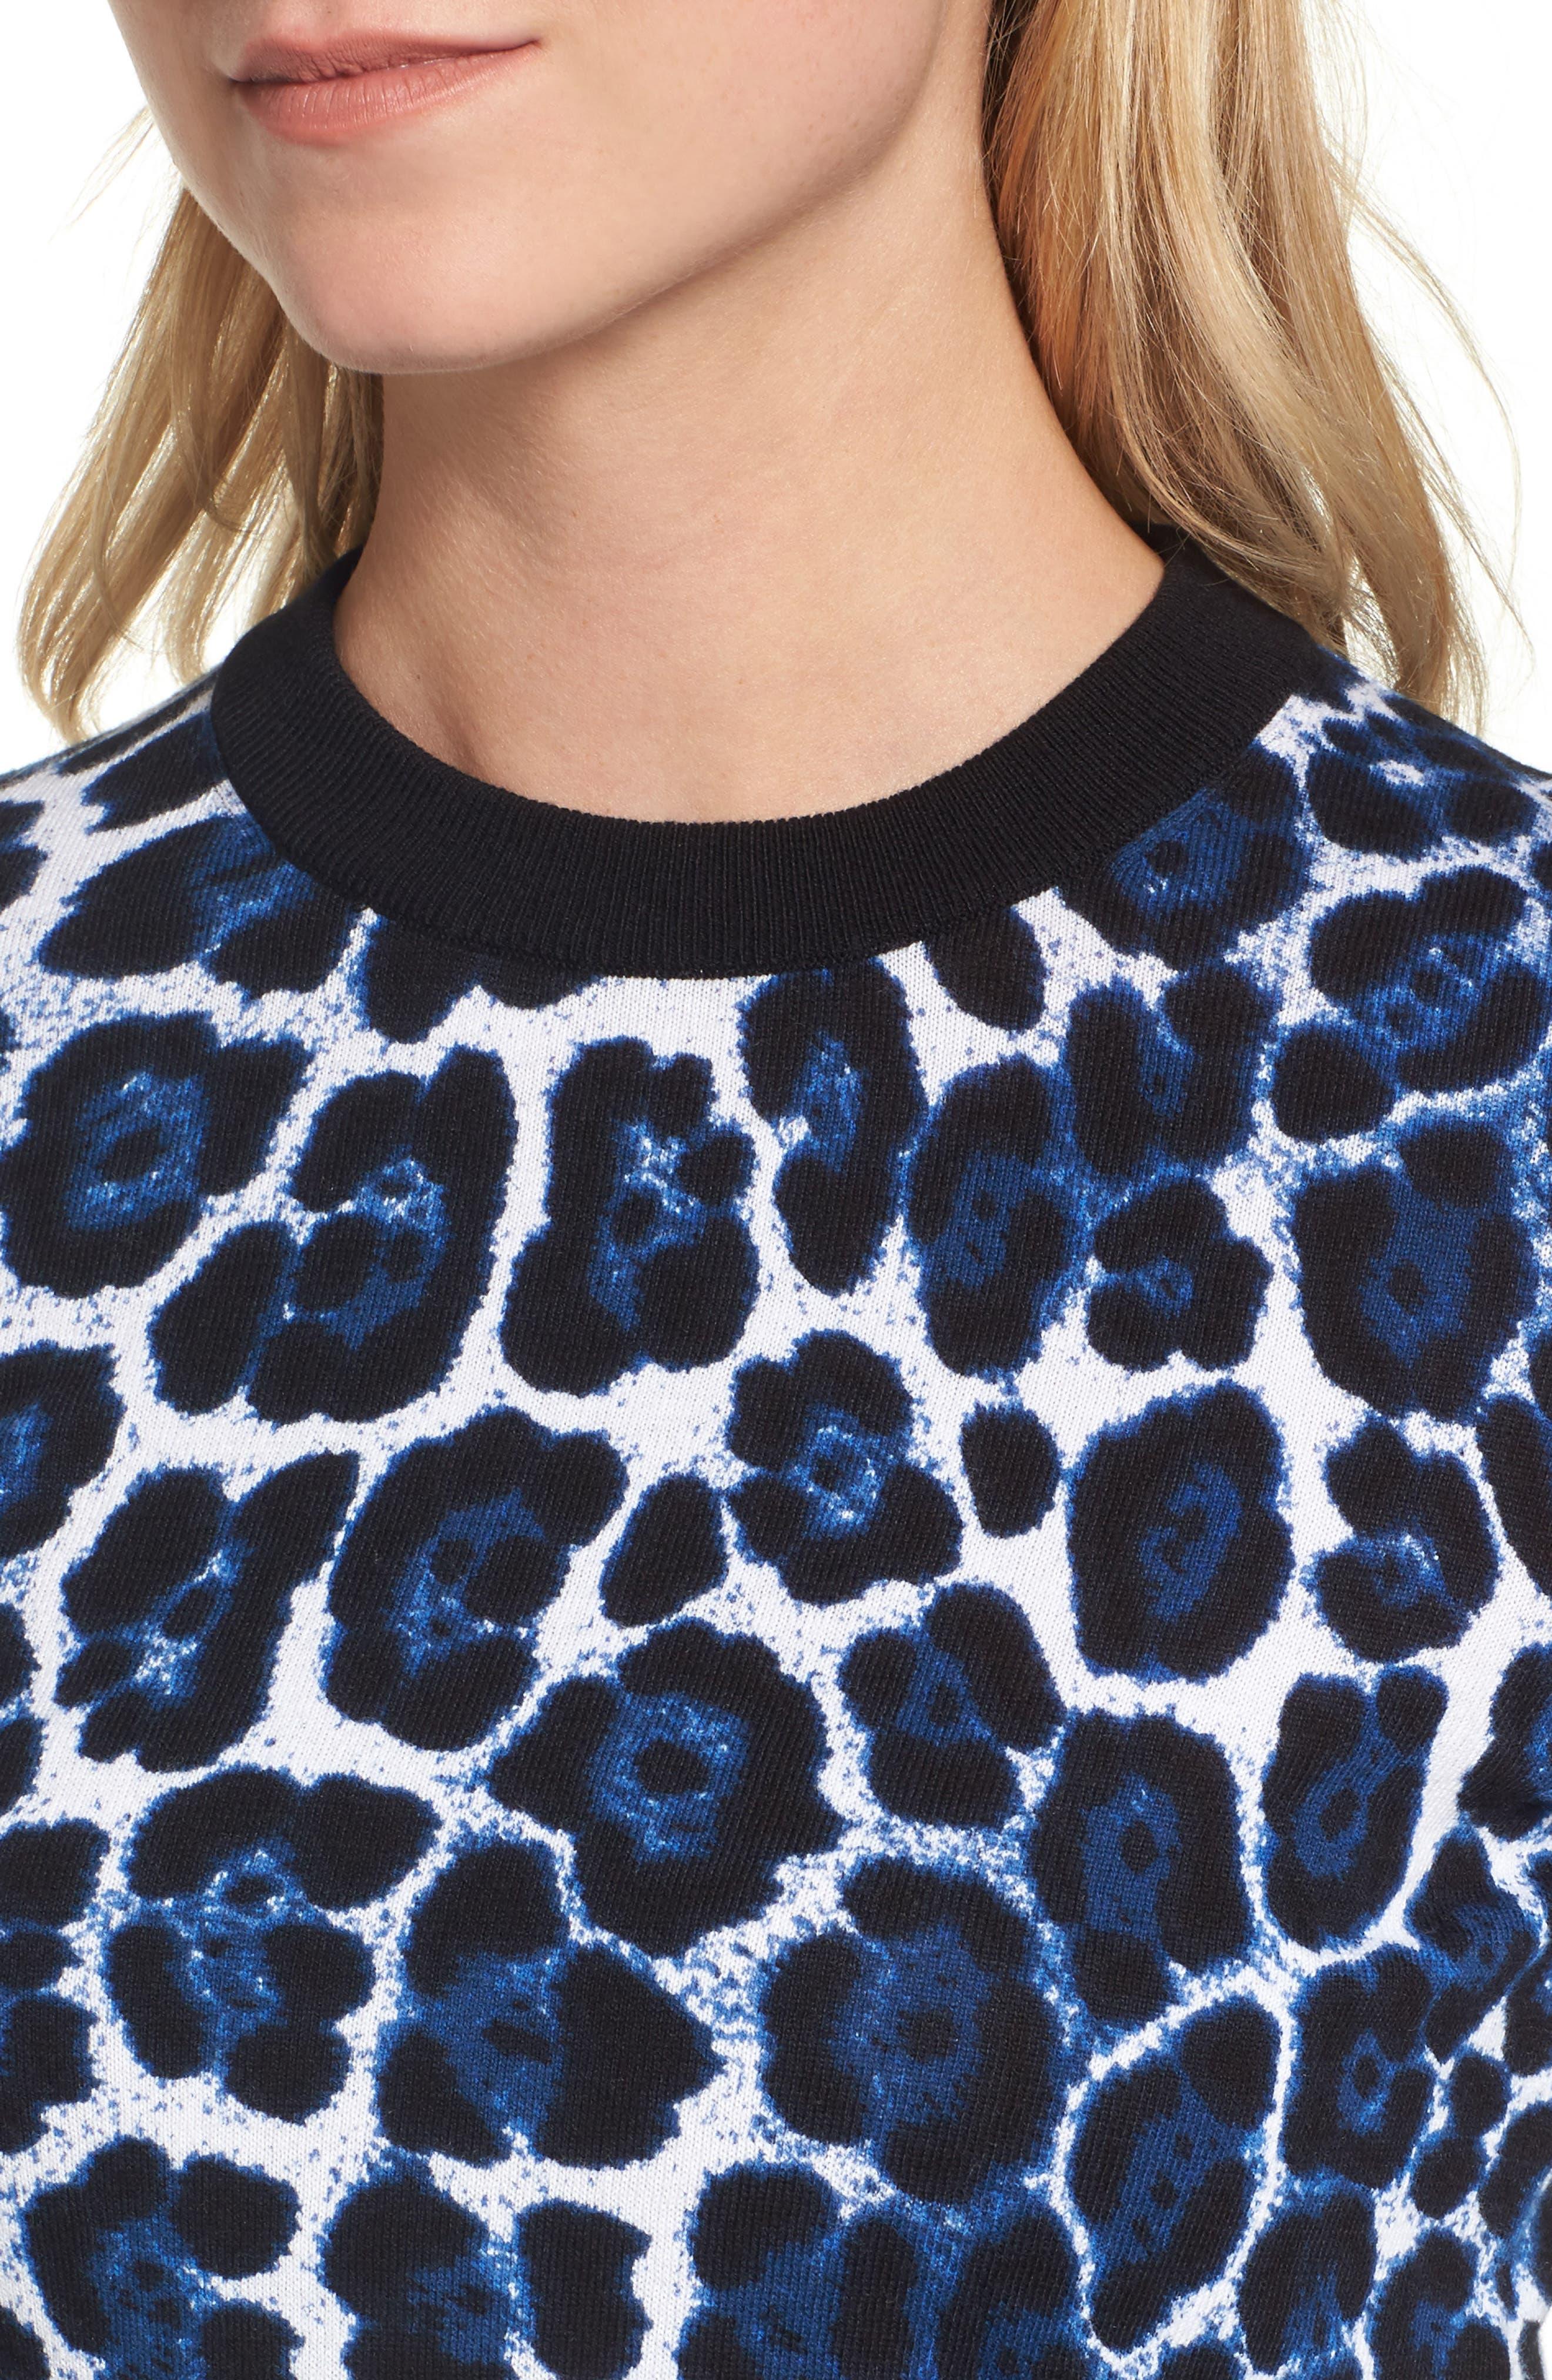 Cheetah Print Sweater,                             Alternate thumbnail 4, color,                             403